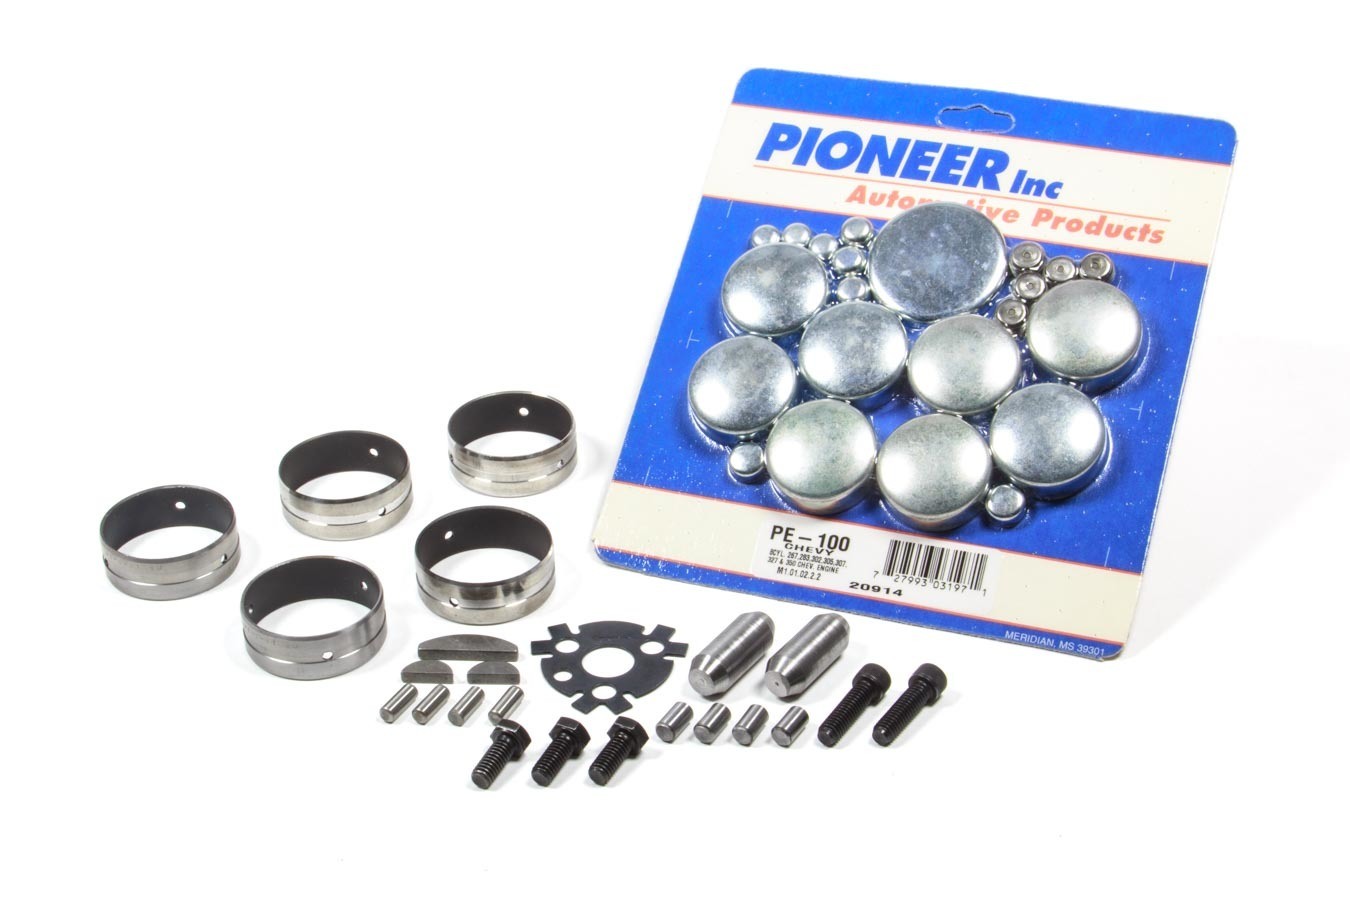 AFM Performance 20013 Engine Block Hardware, Camshaft Bearings, Dowel Pins, Freeze Plugs, Keys, Small Block Chevy, Kit